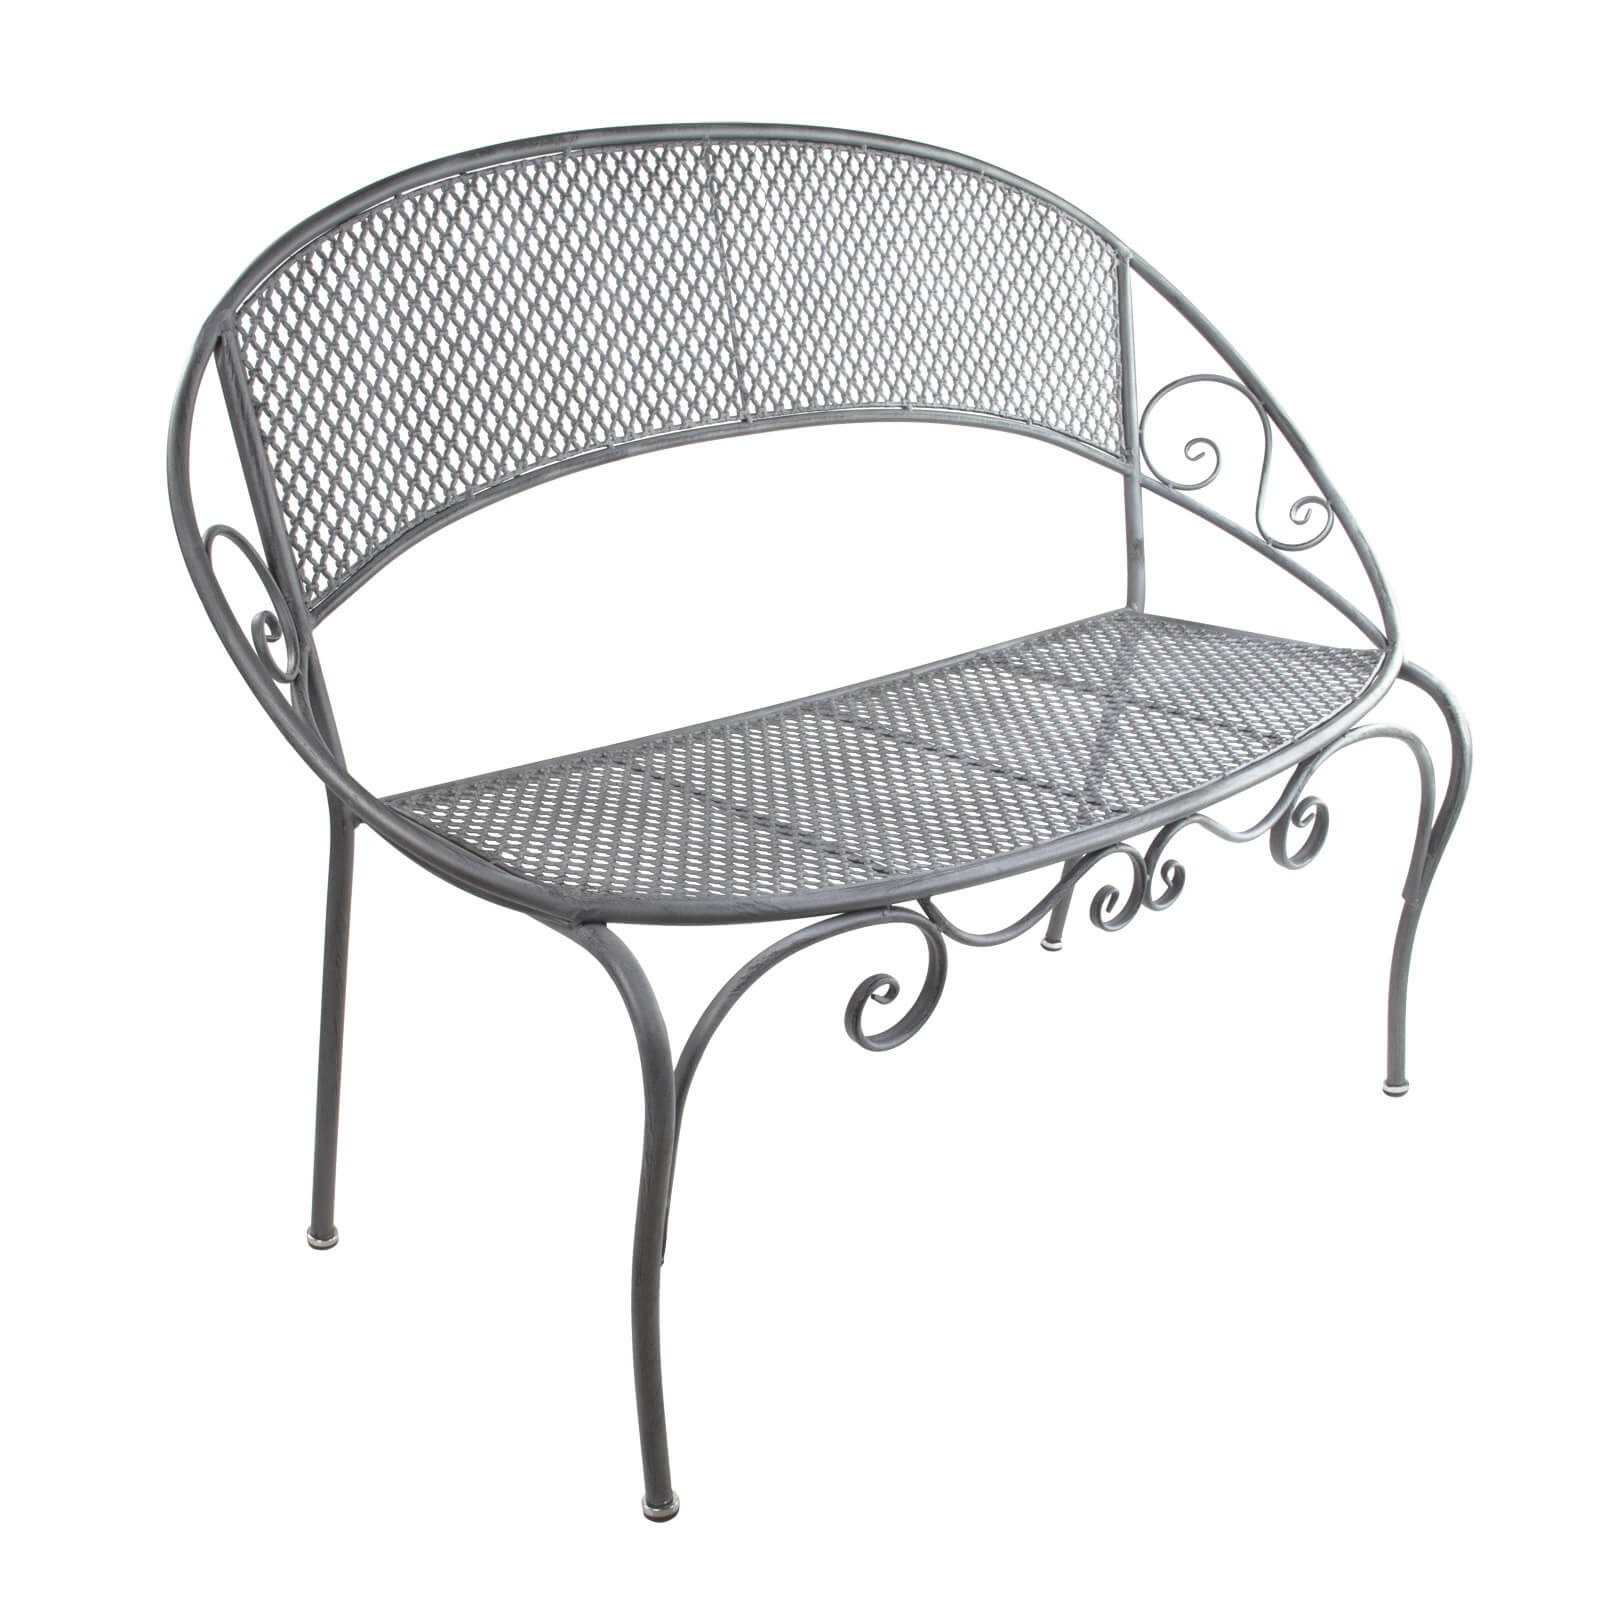 gartenbank parkbank provence grau 124x60x91 cm. Black Bedroom Furniture Sets. Home Design Ideas